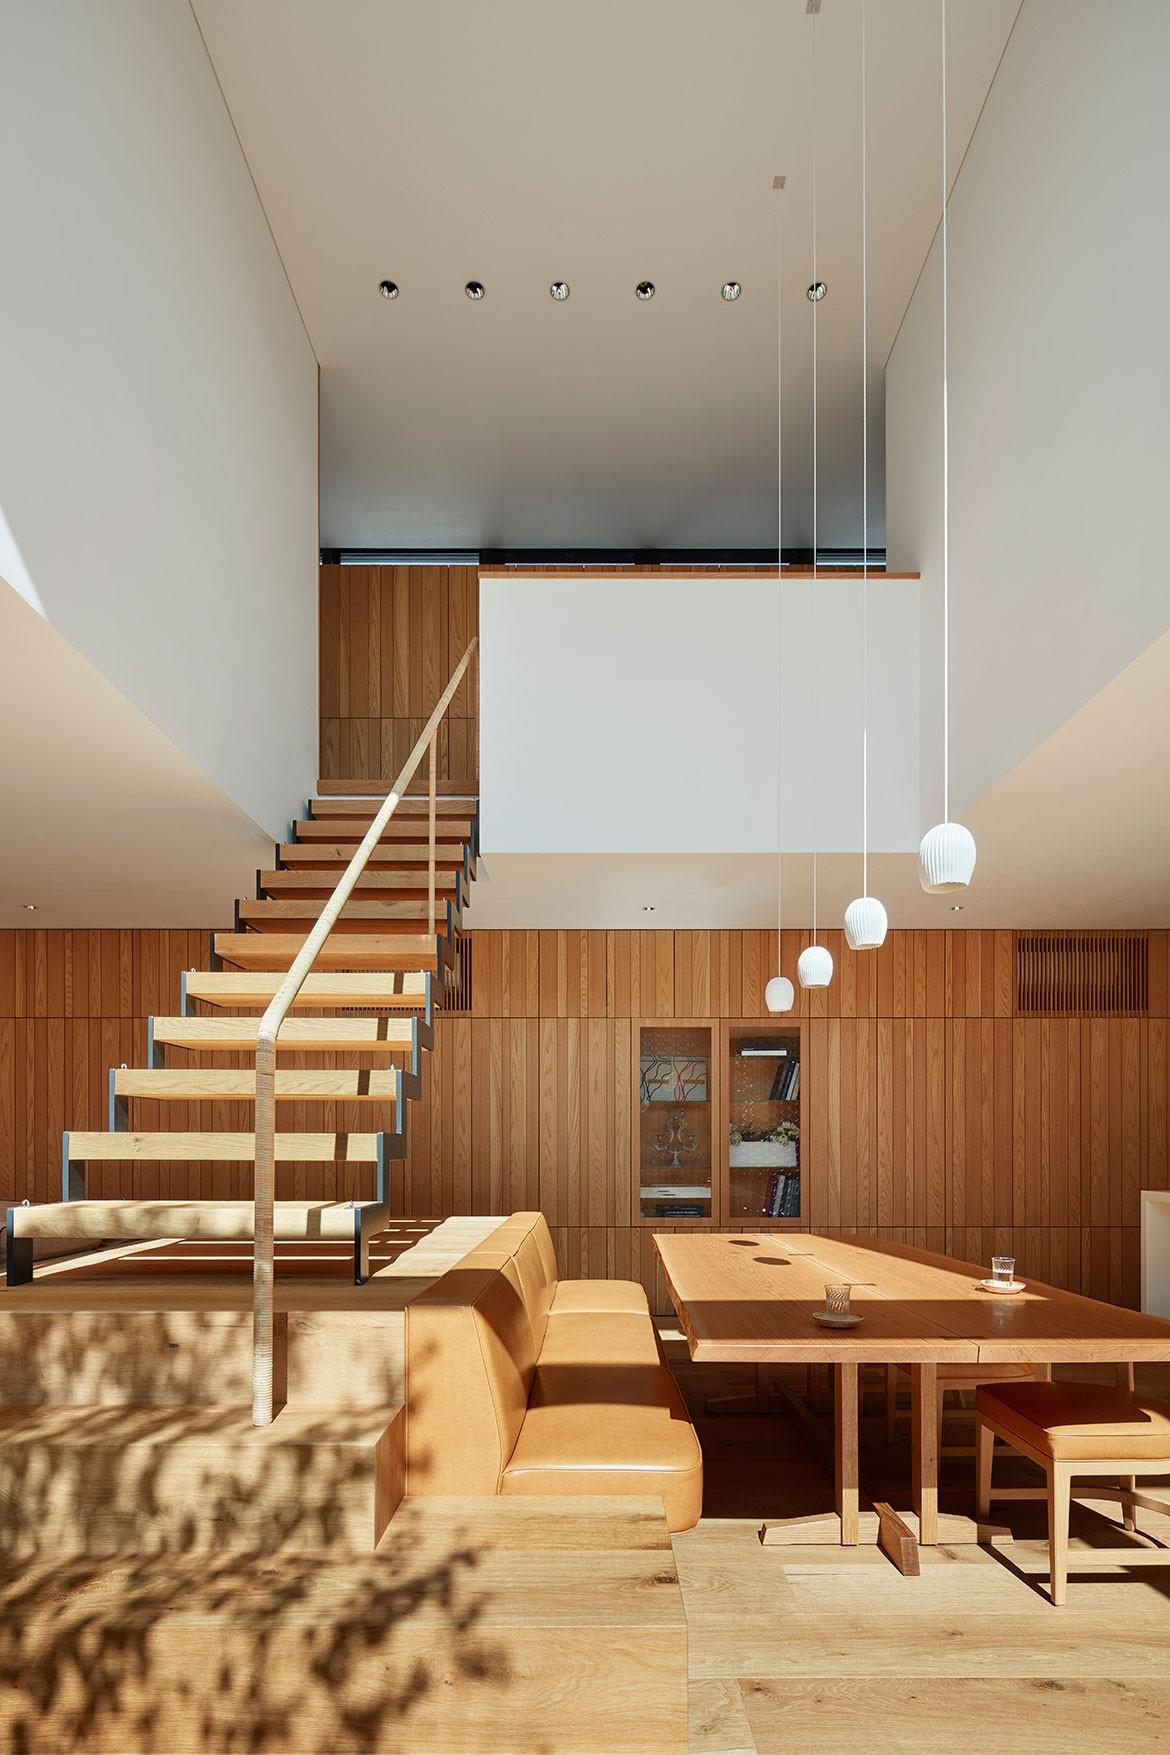 Radiator House Hiroshi Nakamura Architects interior